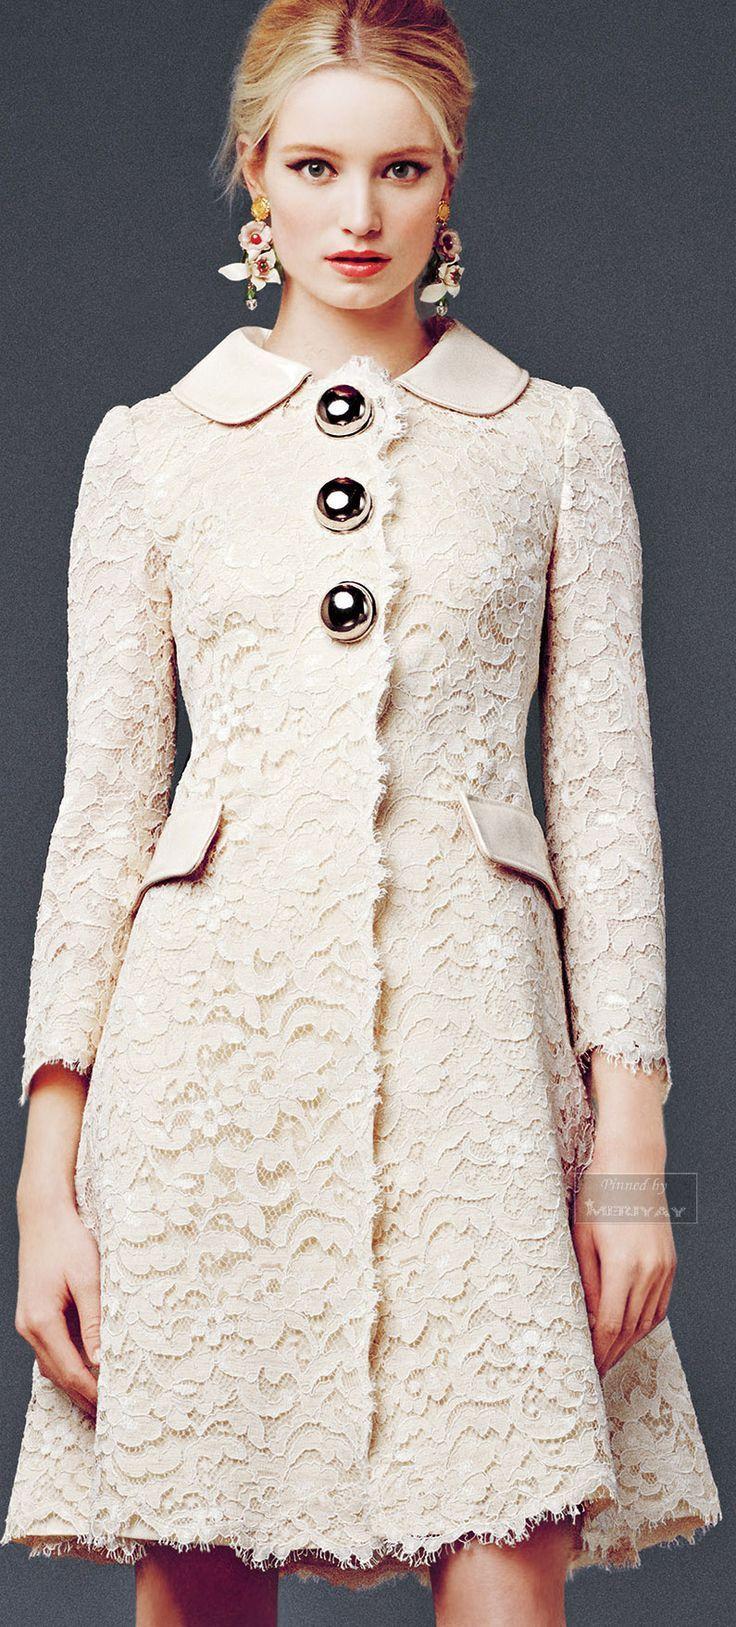 Dolce and Gabbana f/w 2014/2015